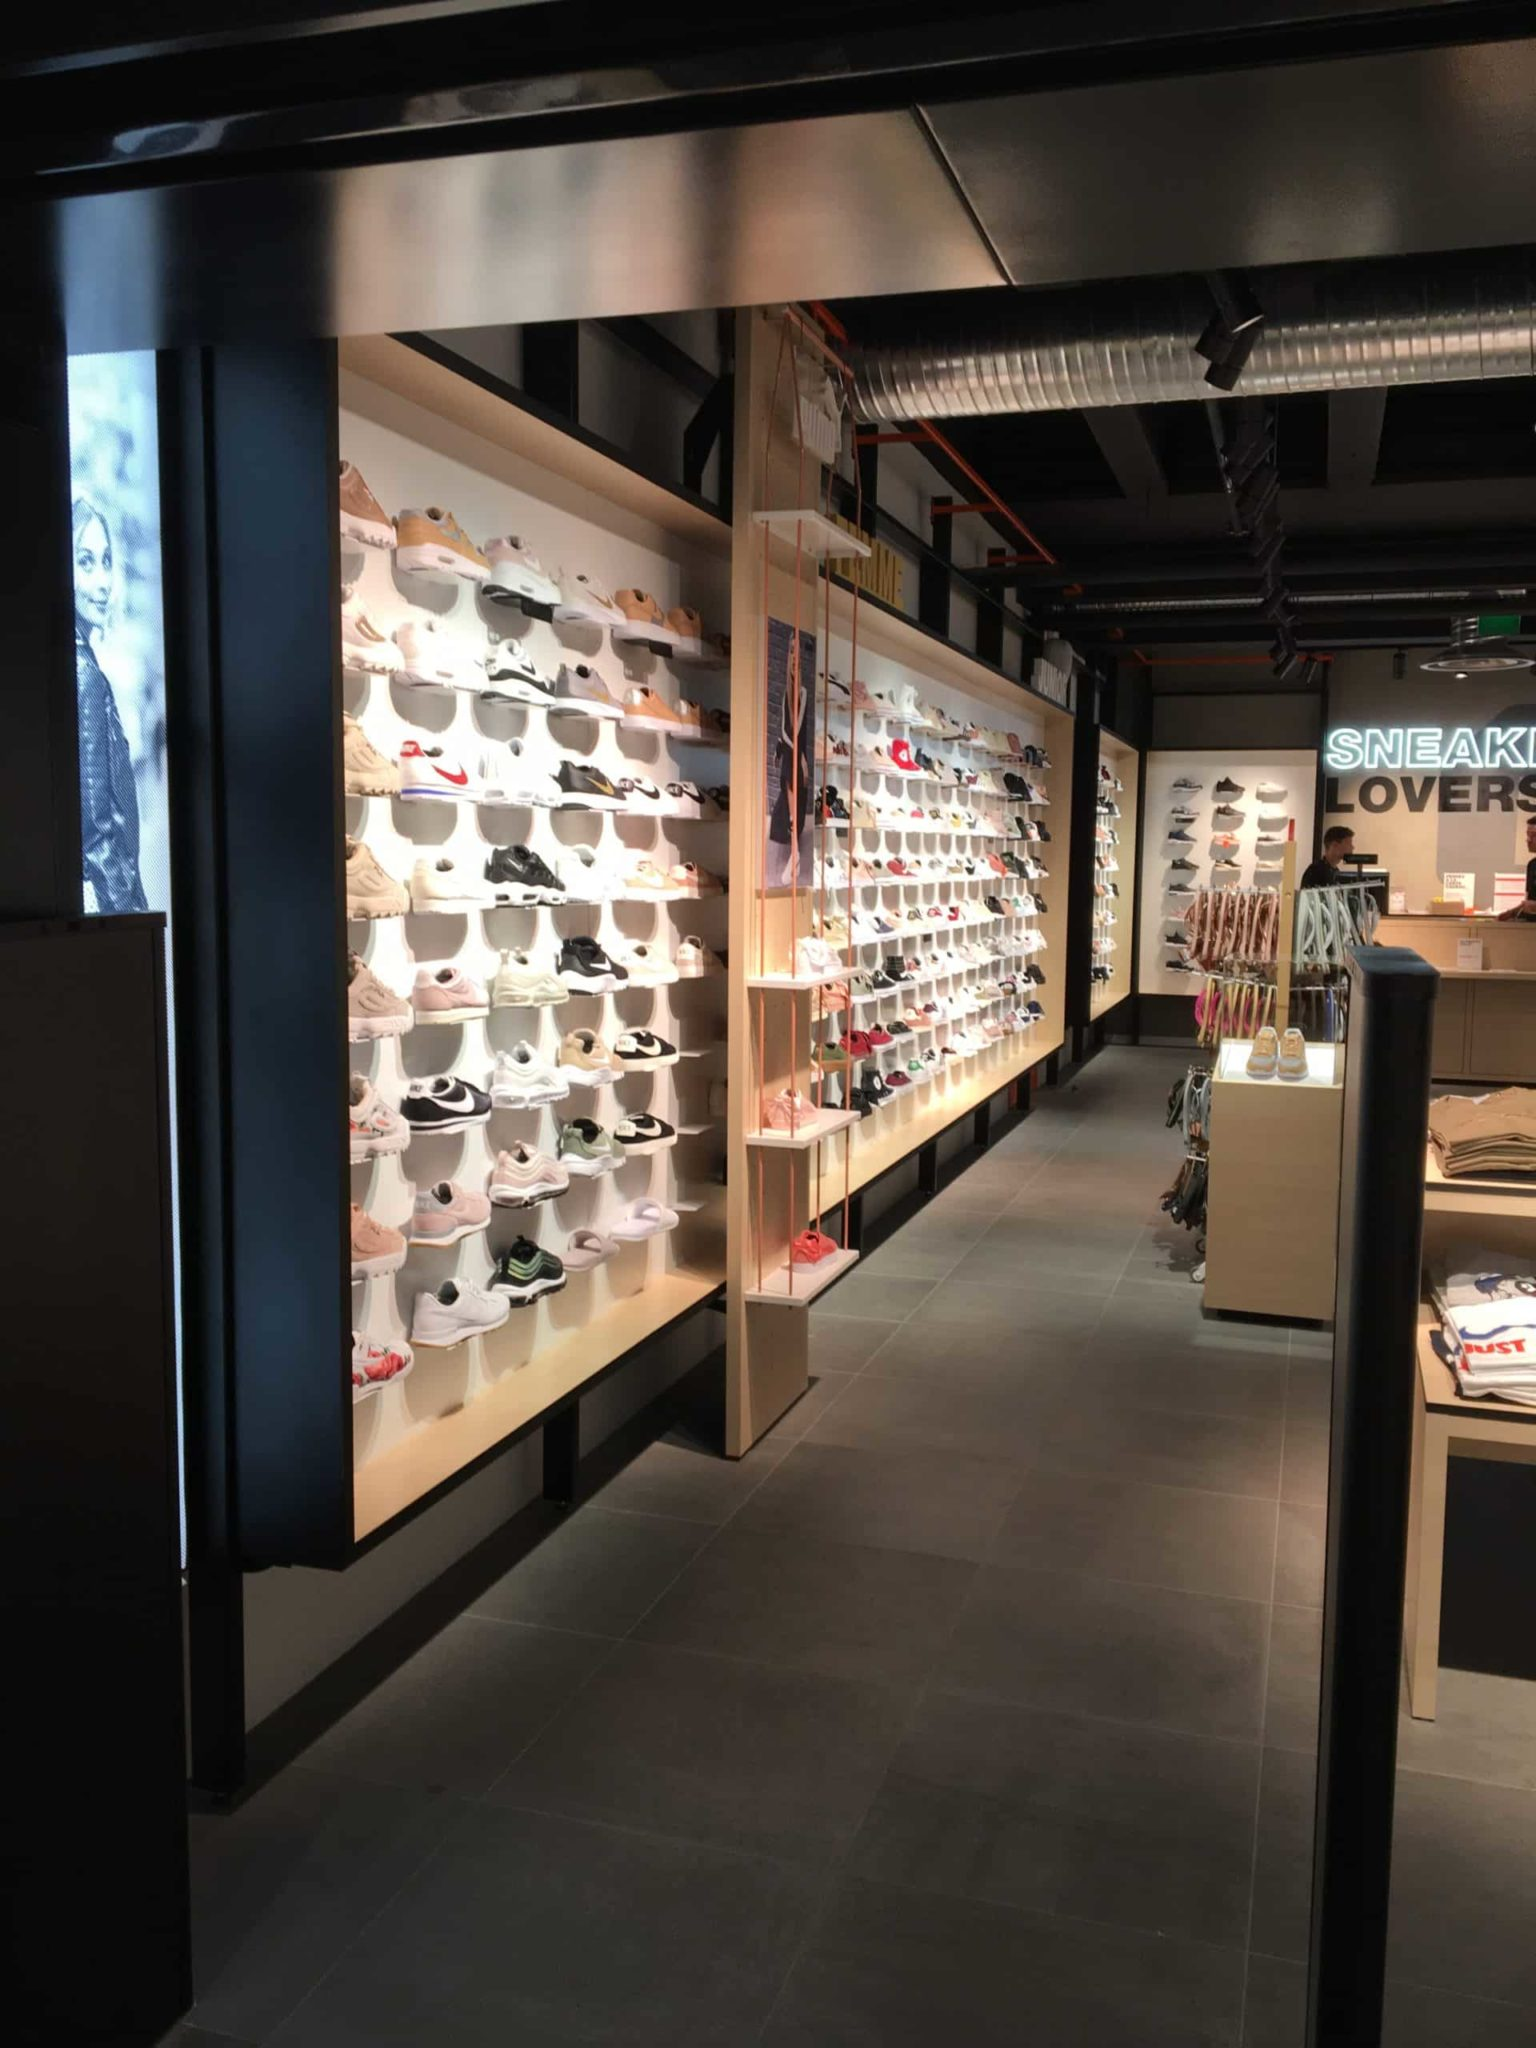 Agencer un magasin de chaussures